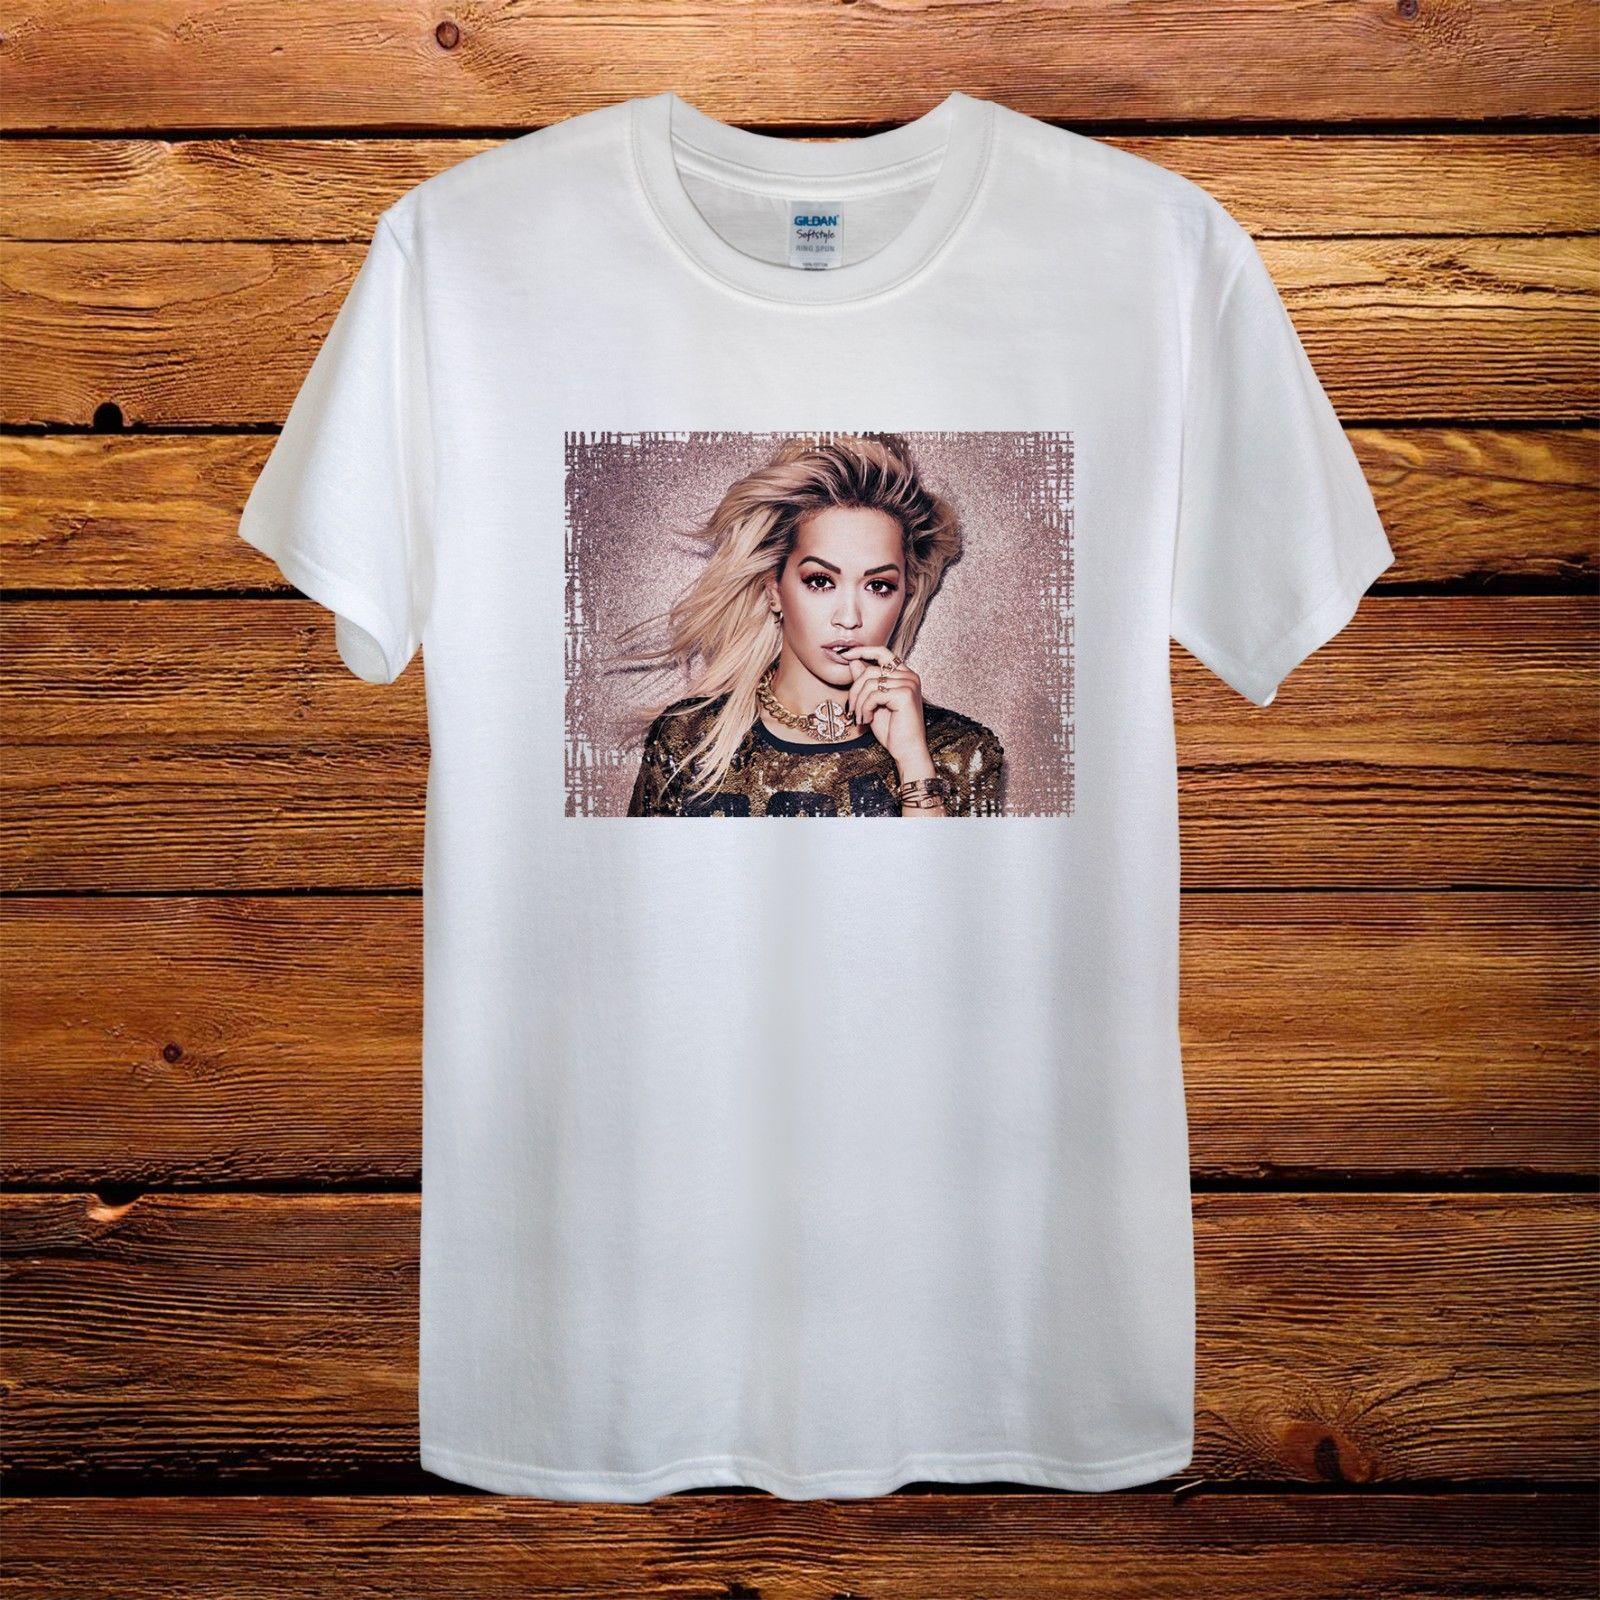 Rita Ora Signer Sexy Tour Gift Top Design T-Shirt Men Unisex Women Fitted